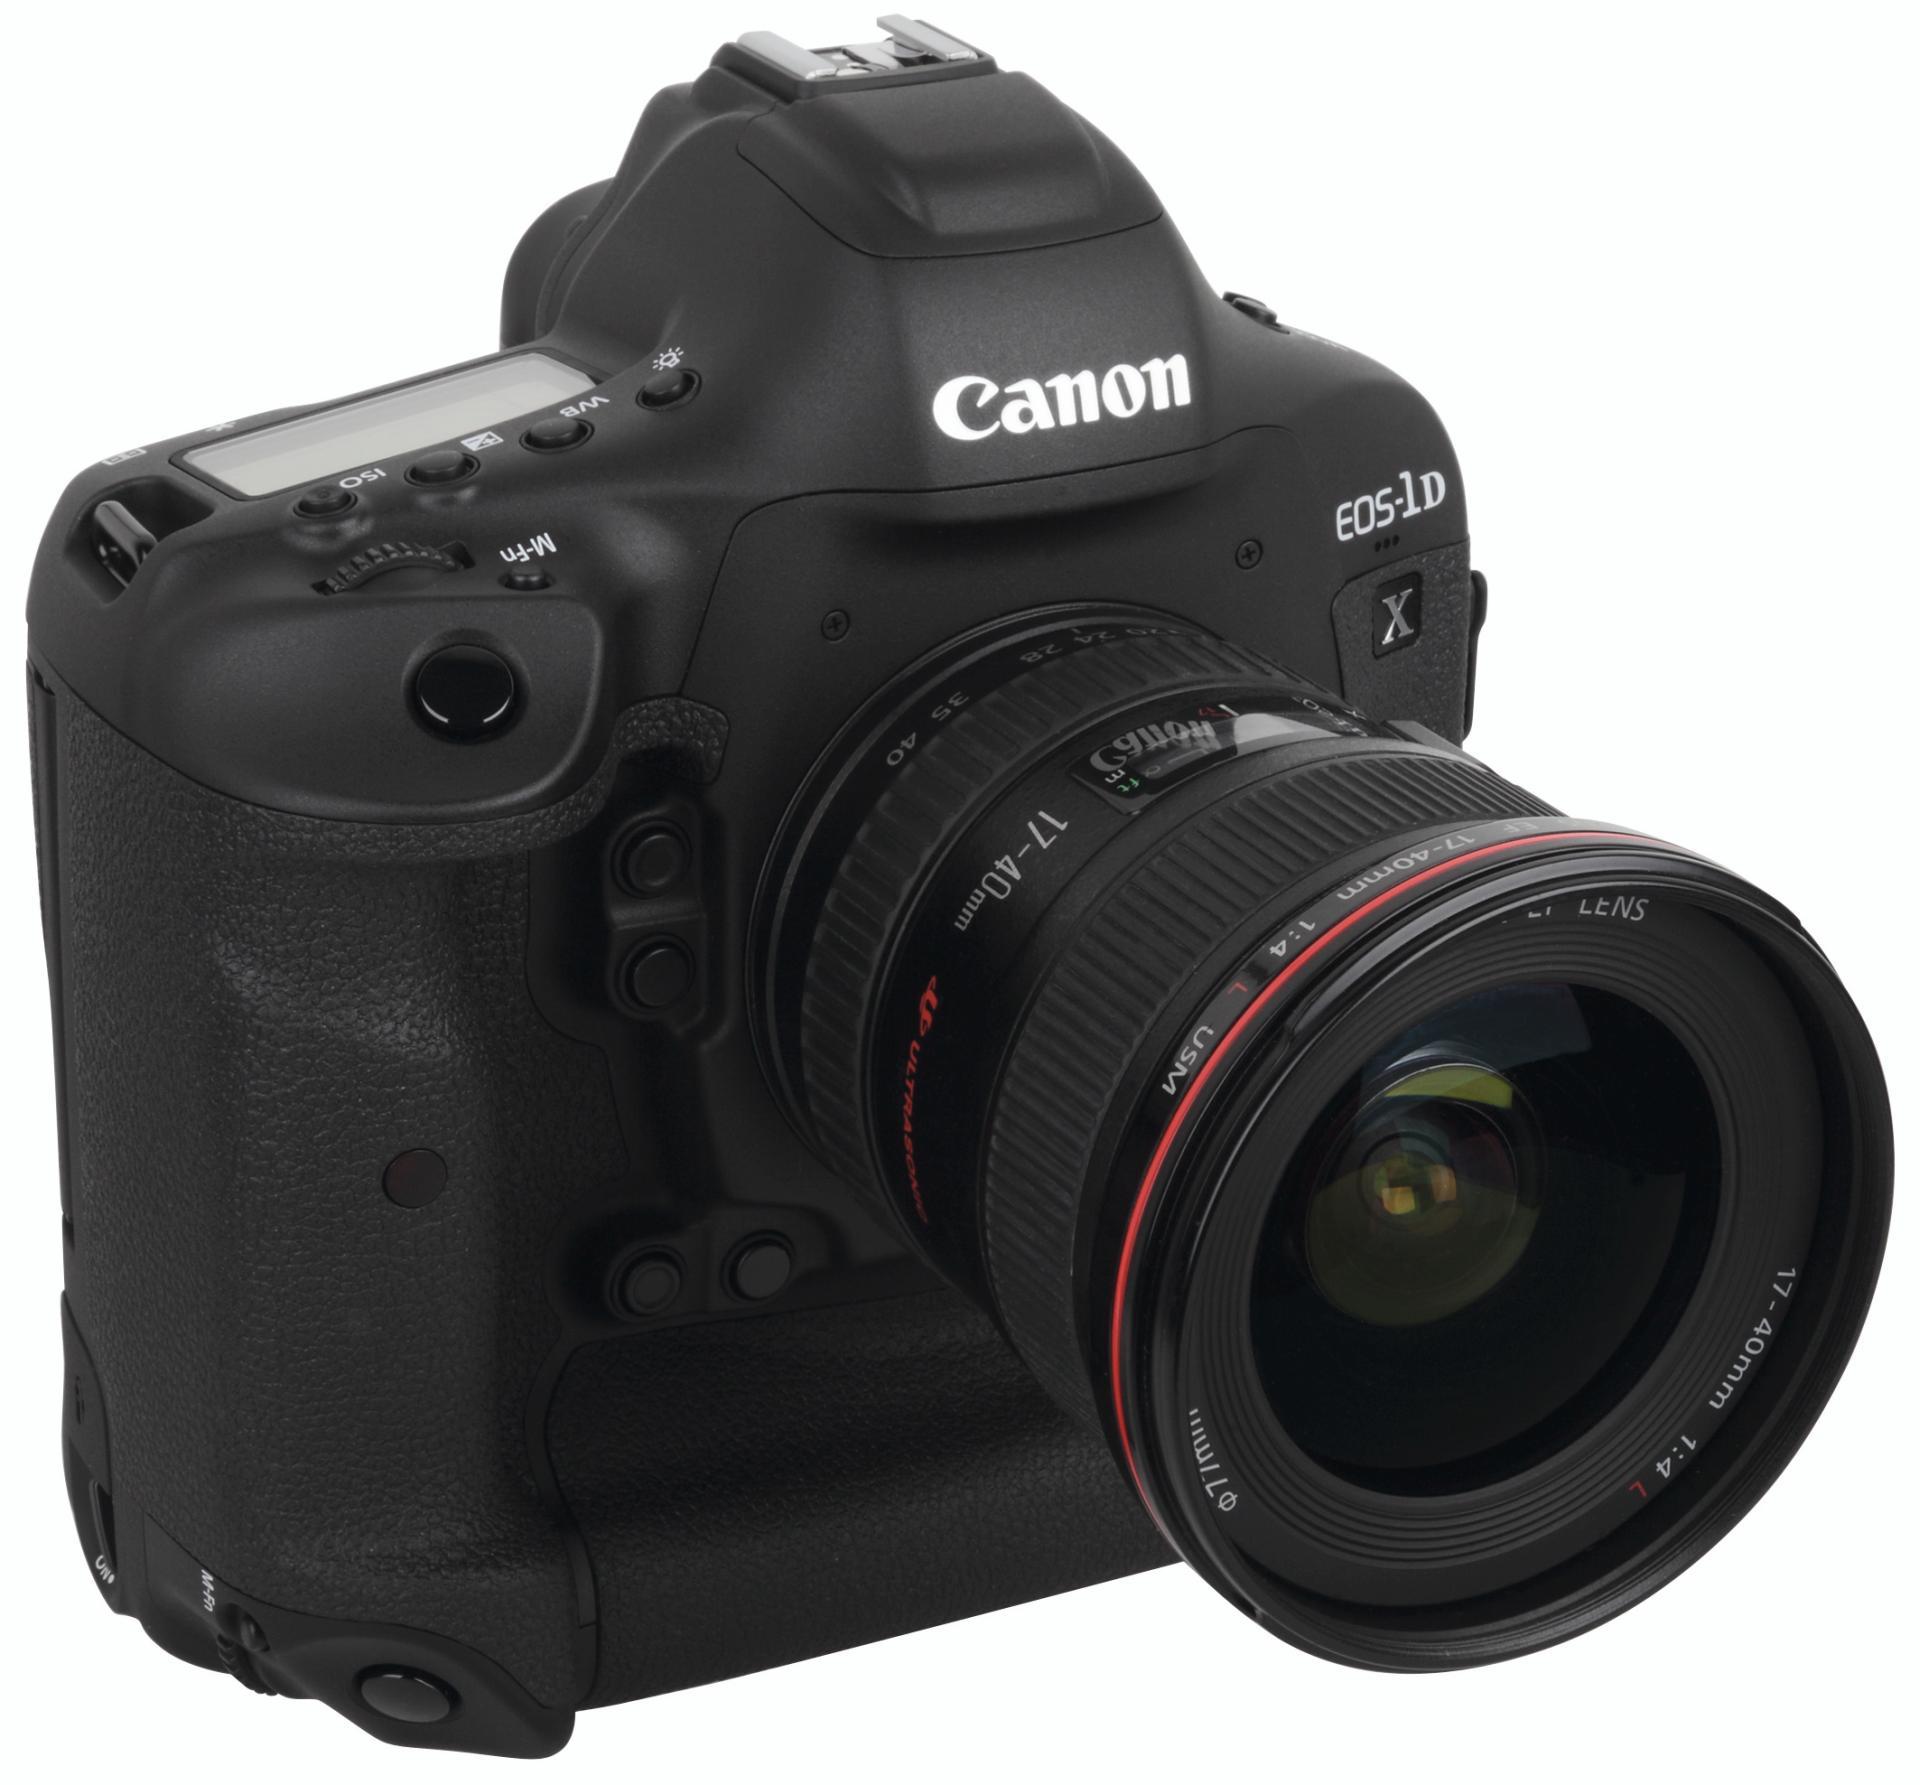 Kameratest Canon EOS 1-D X Mark II & Pentax K-1 | FOTO HITS Magazin